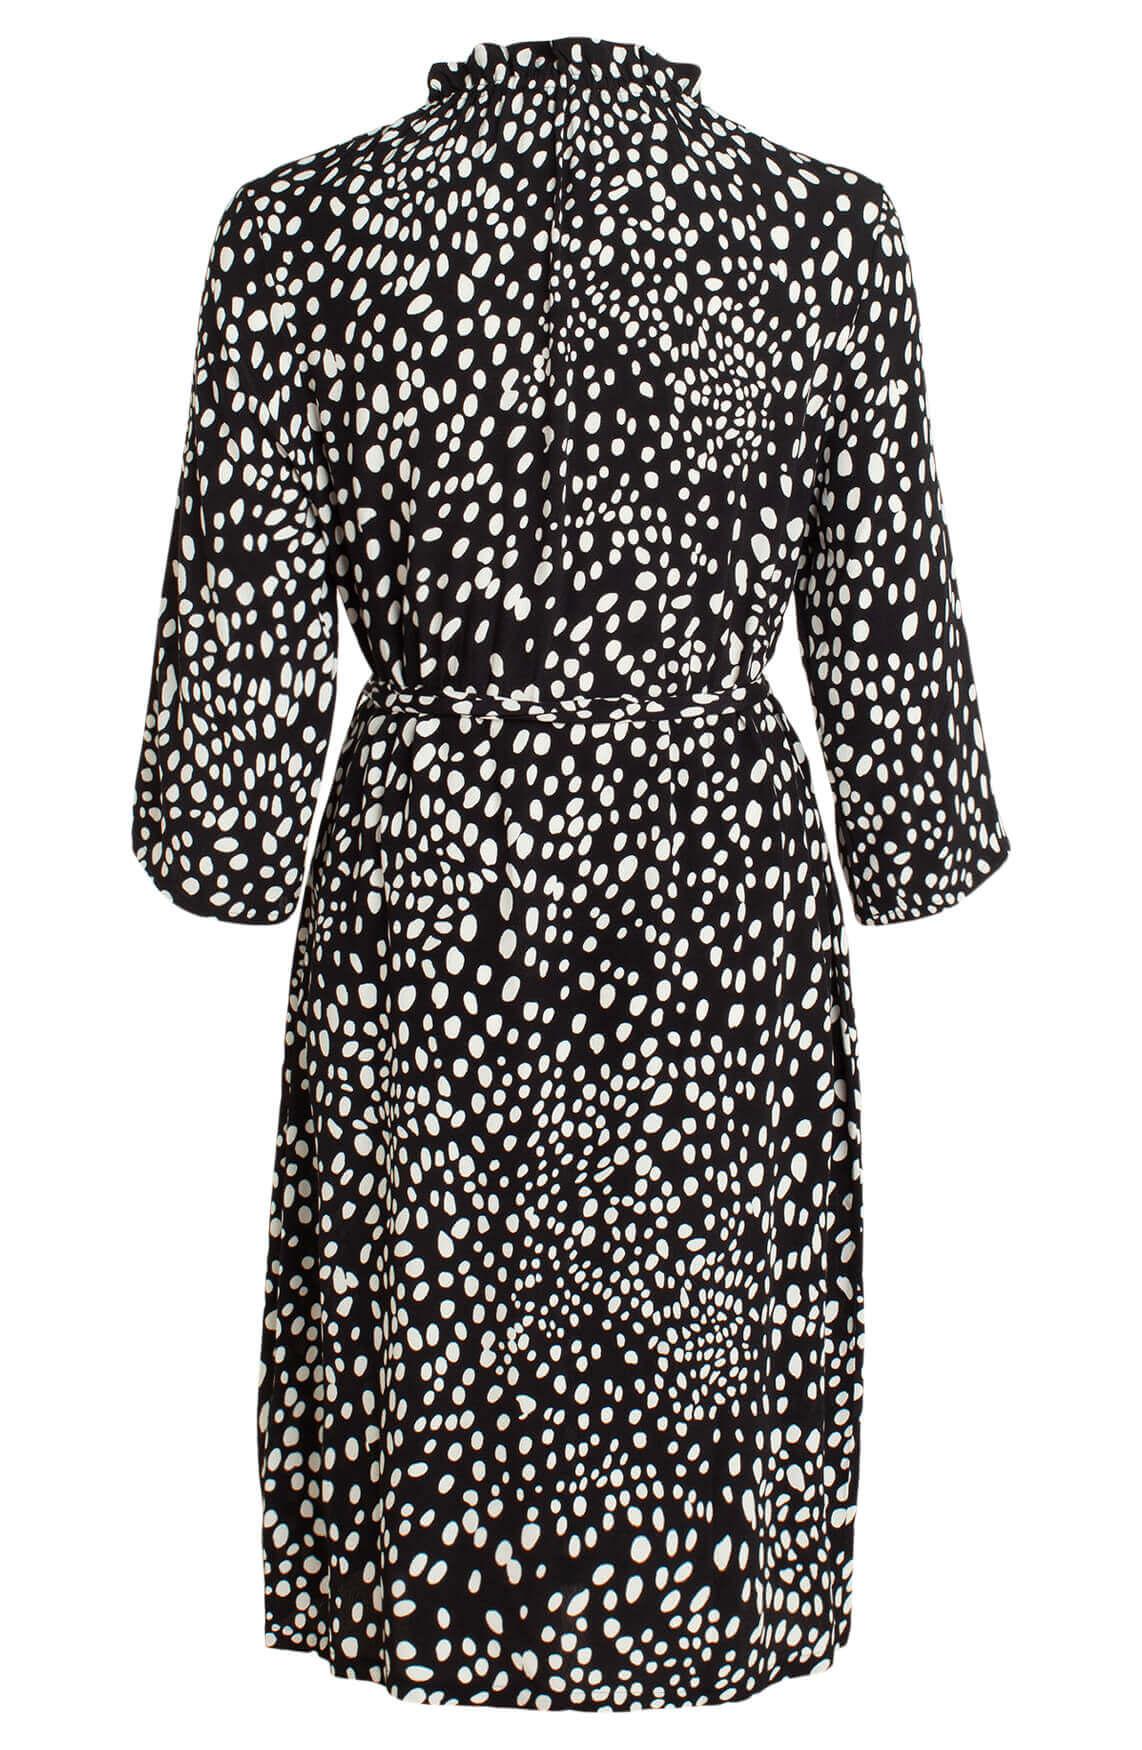 Anna Dames Polkadot jurk zwart